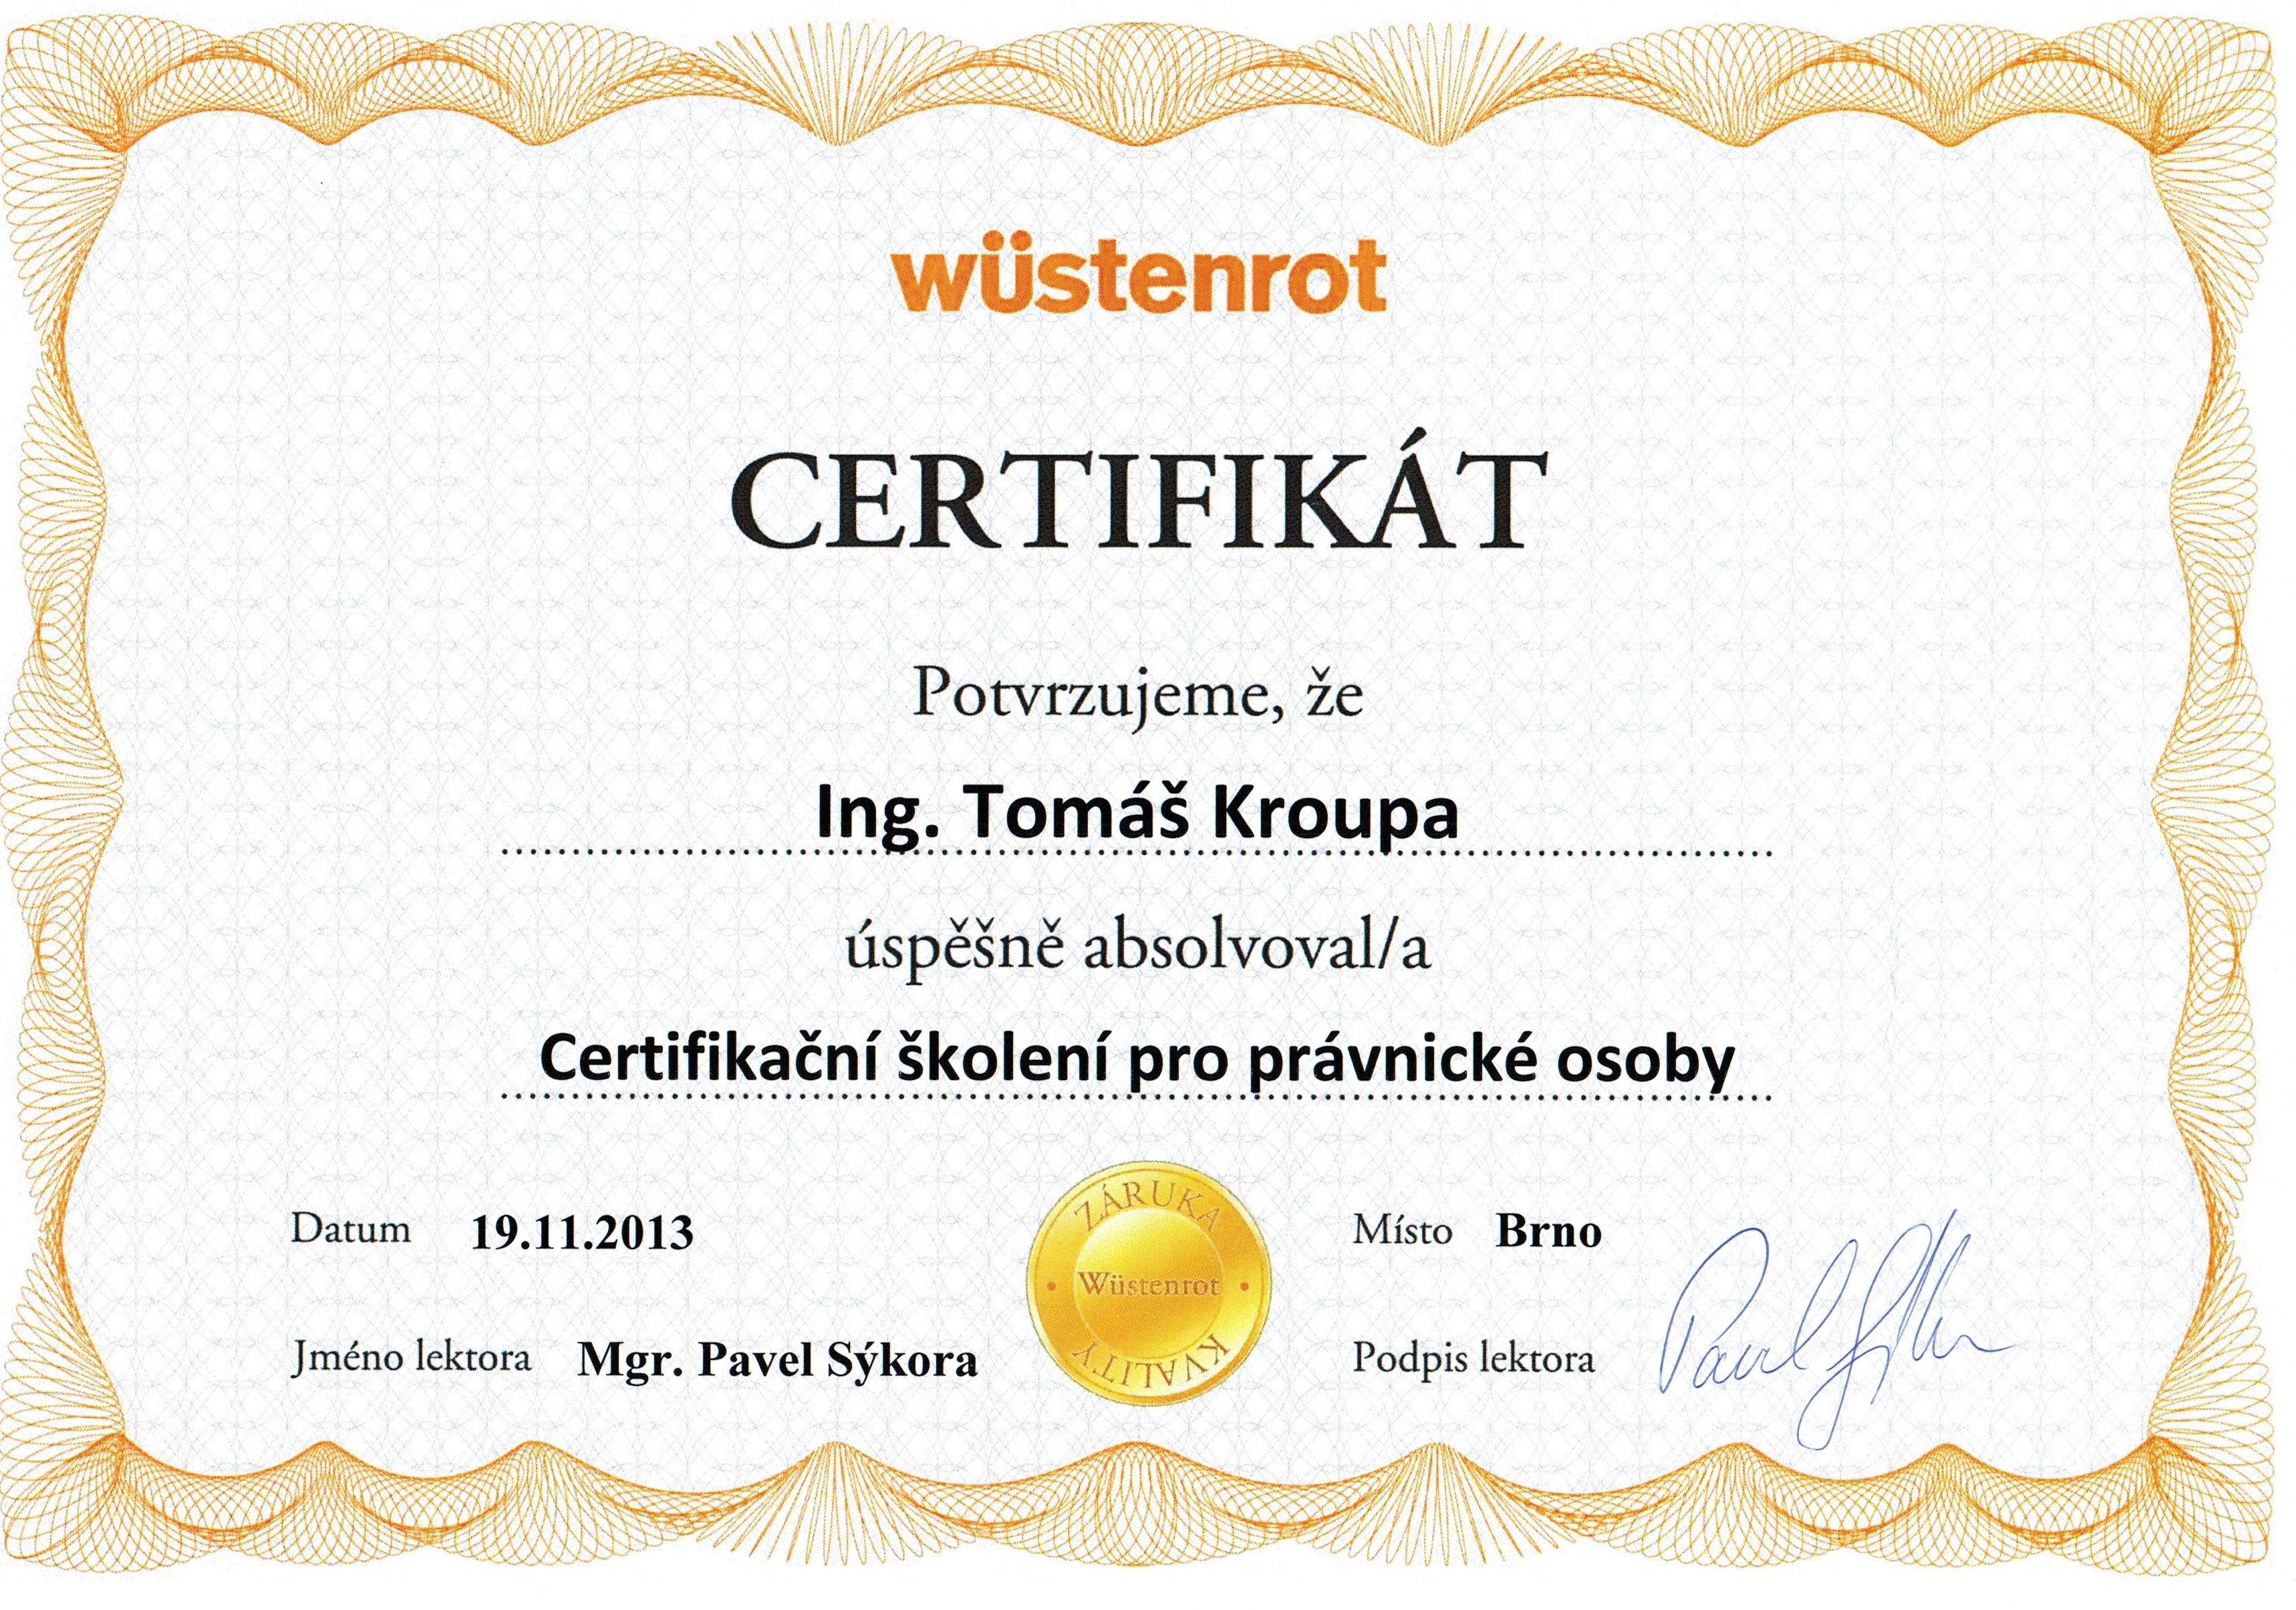 Wüstenrot certifikát